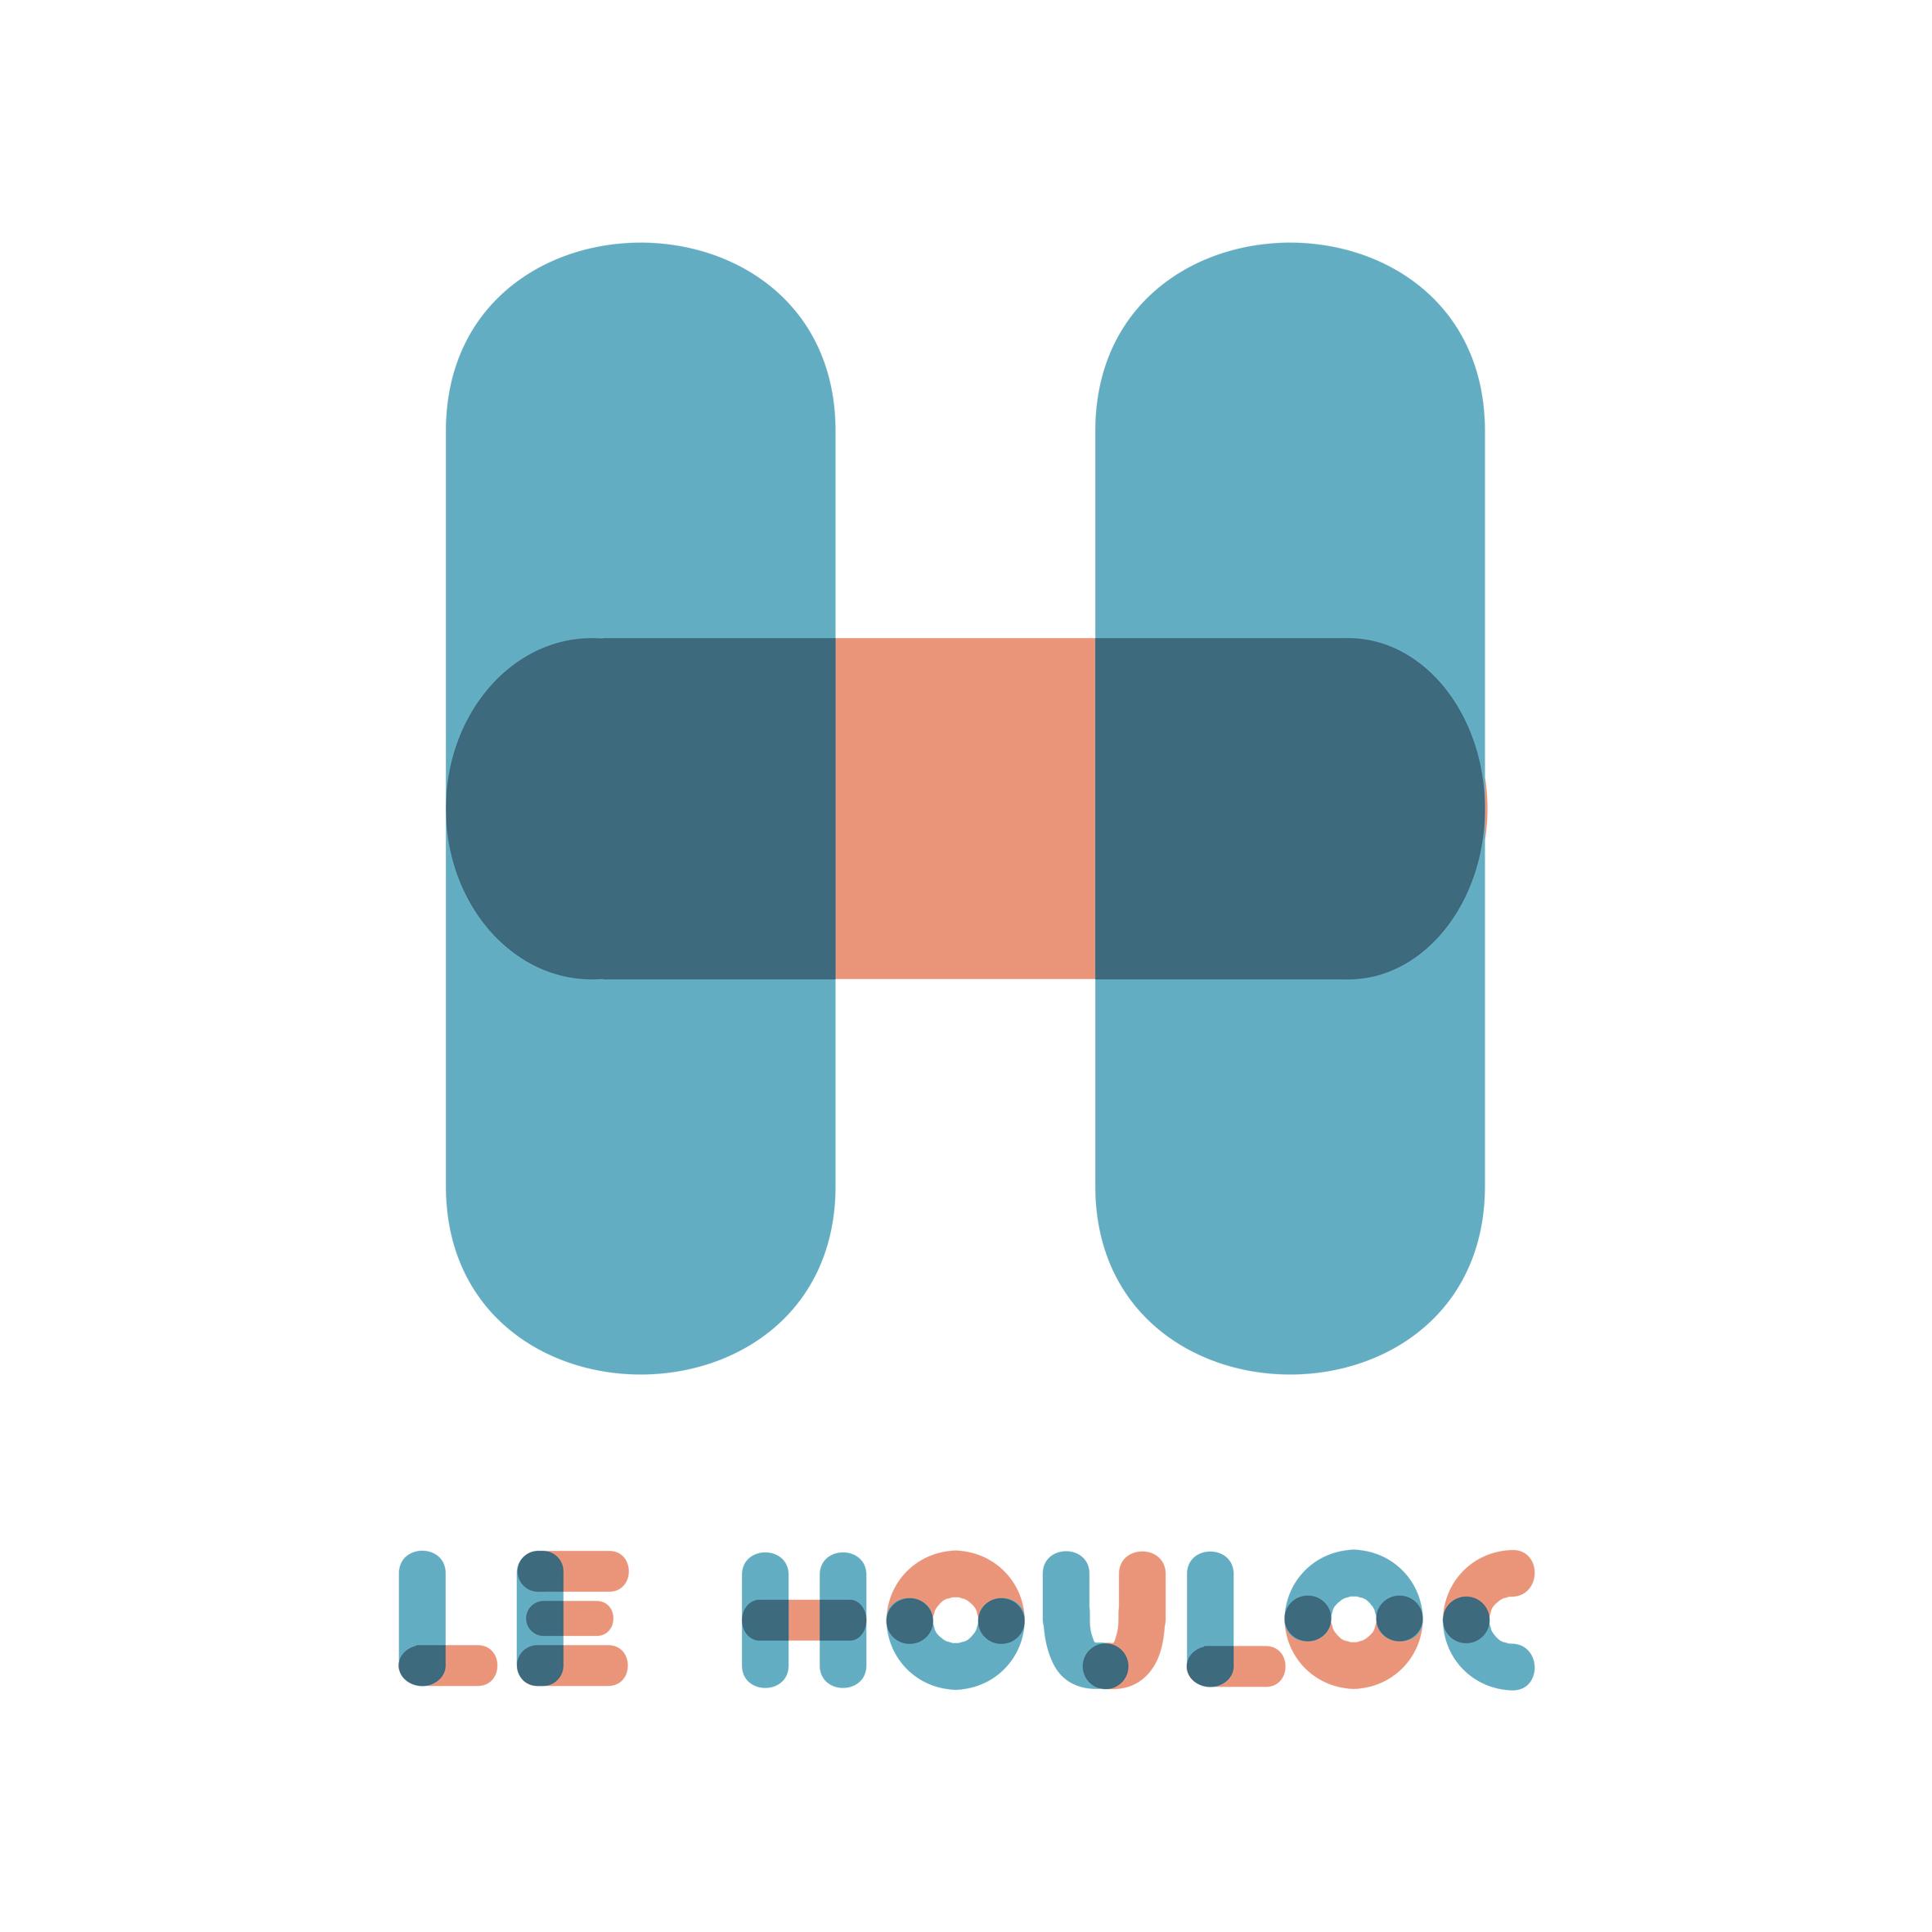 Le Houloc